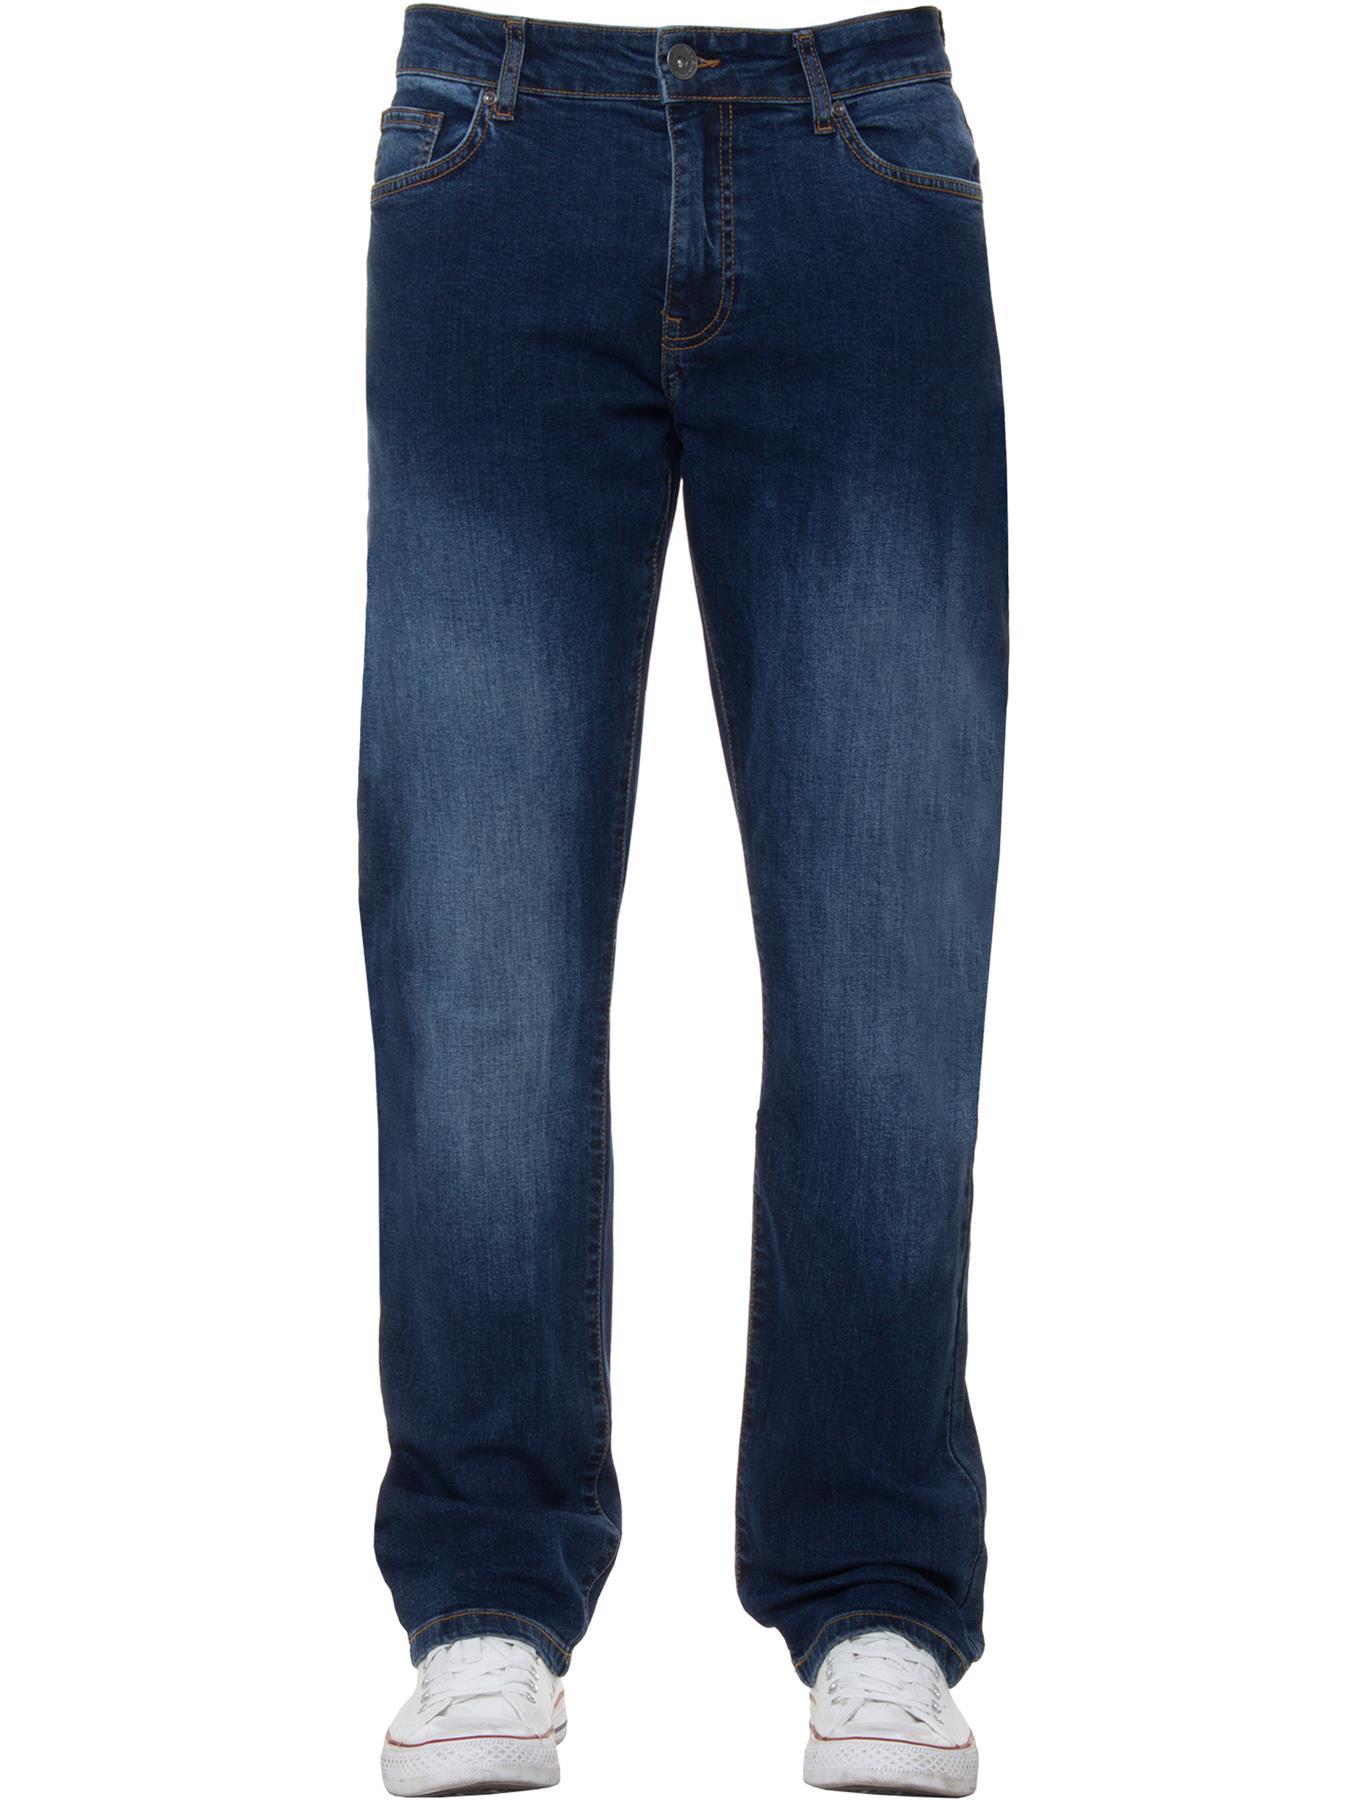 Para-Hombre-Pierna-Recta-Bootcut-Stretch-Denim-Regulares-Pantalon-de-trabajo-Kruze-Todas-Cinturas miniatura 45